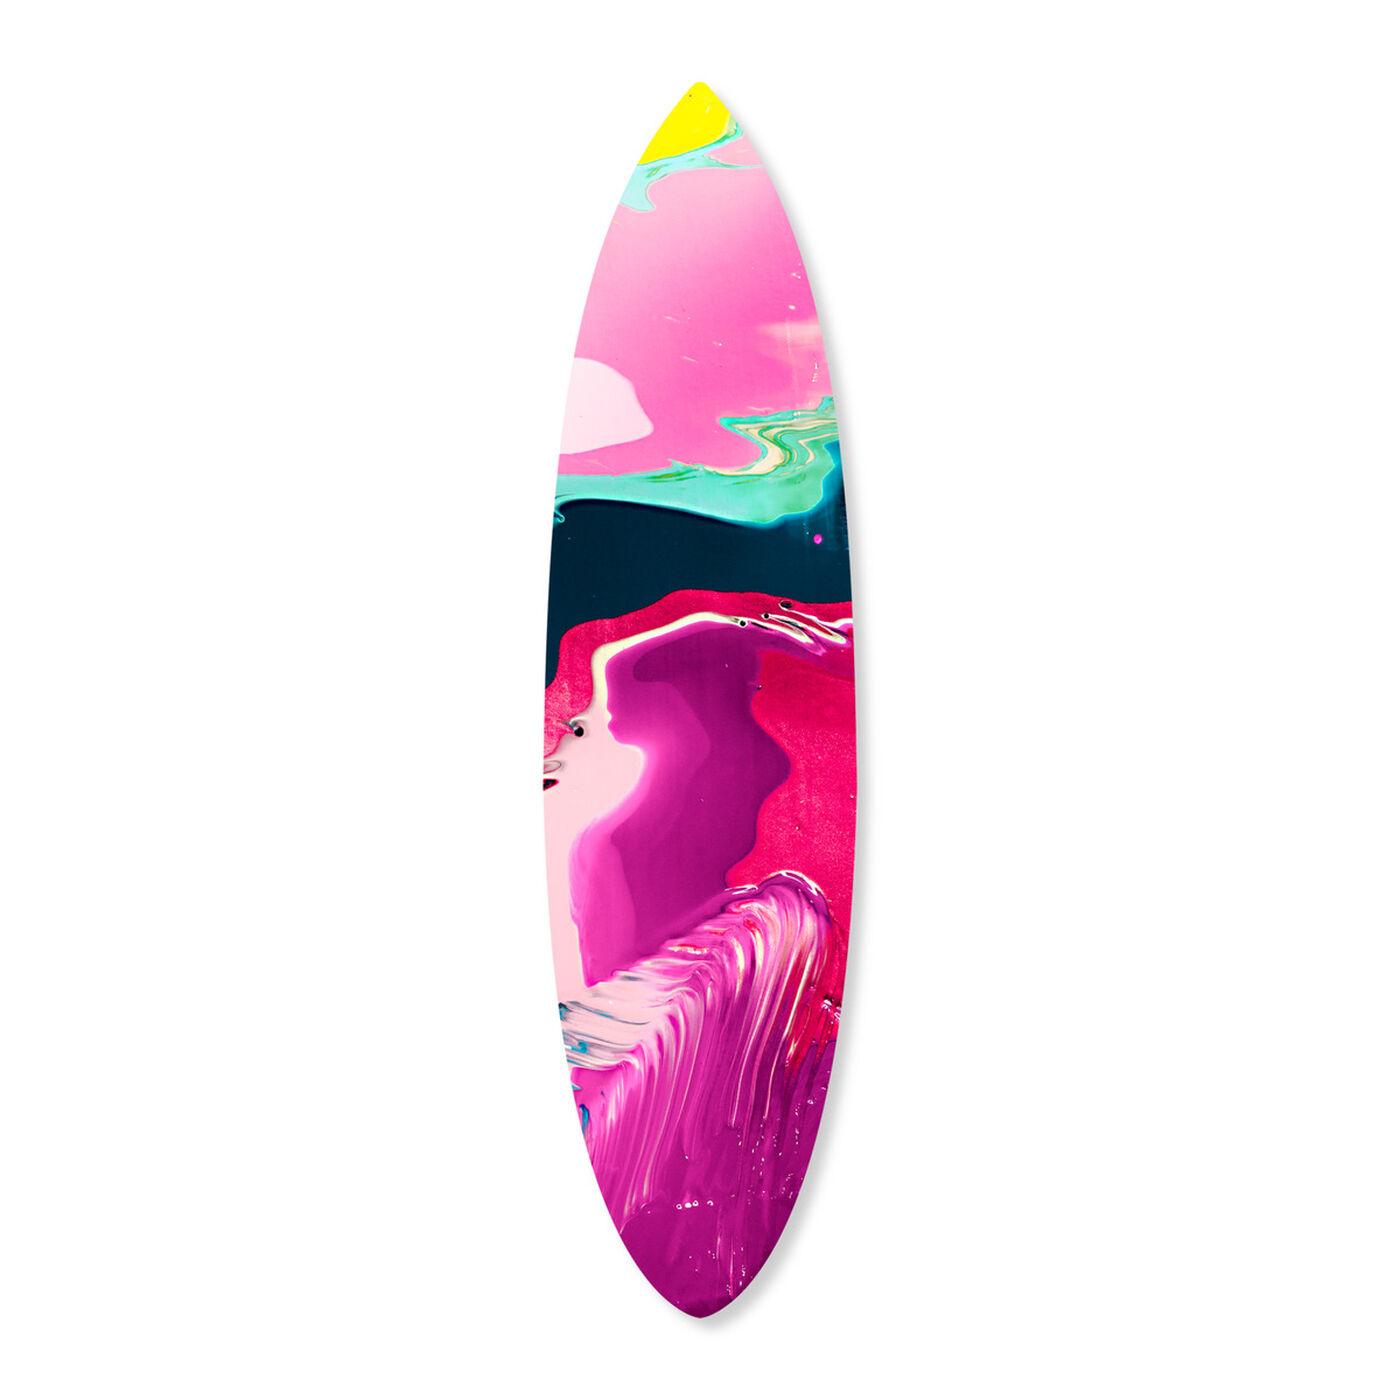 Surreal Dreams Surfboard Flat